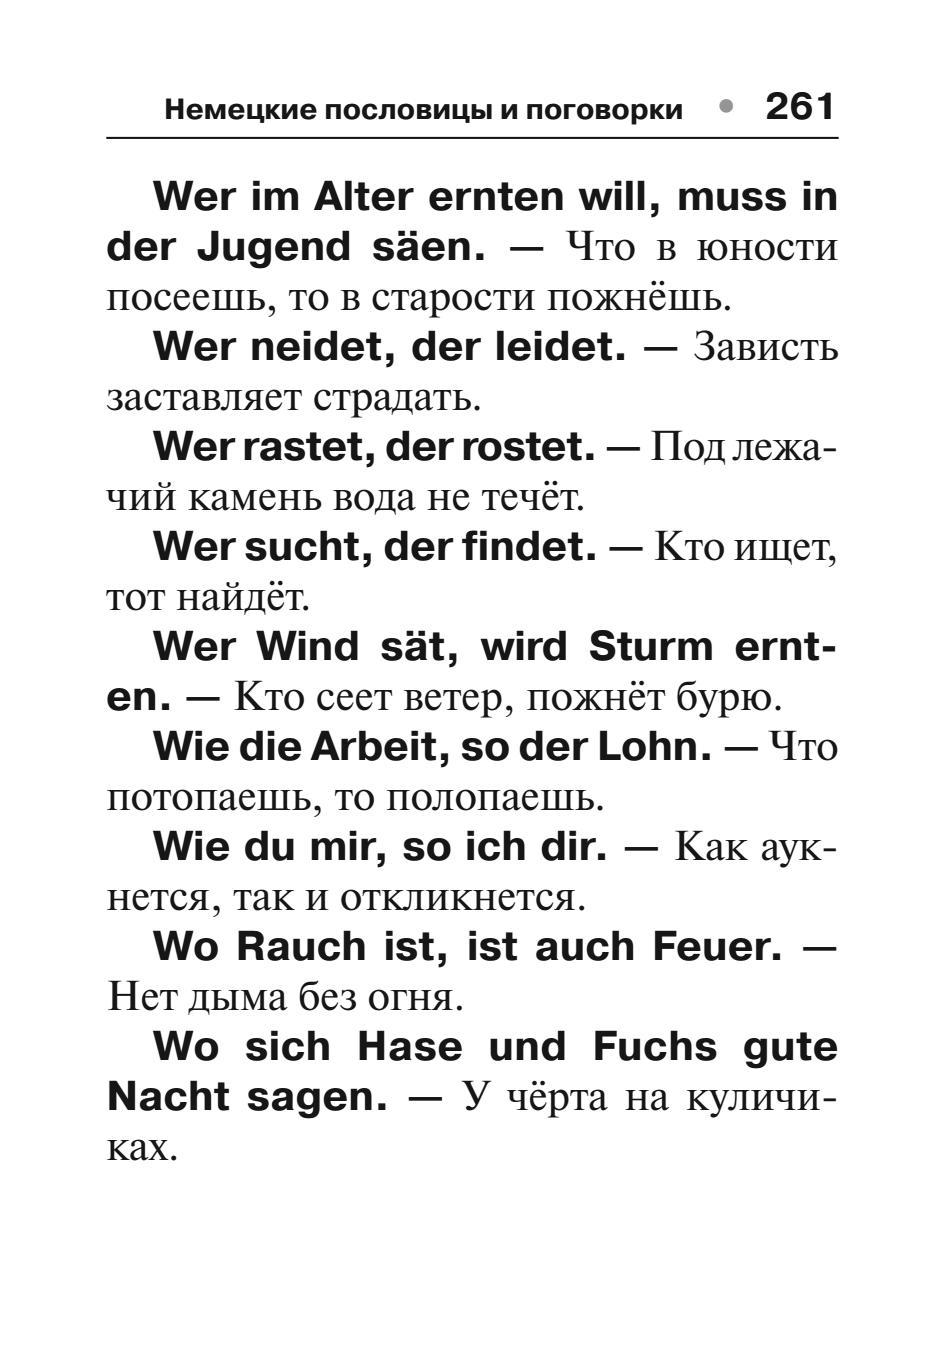 Пословицы на немецком картинки